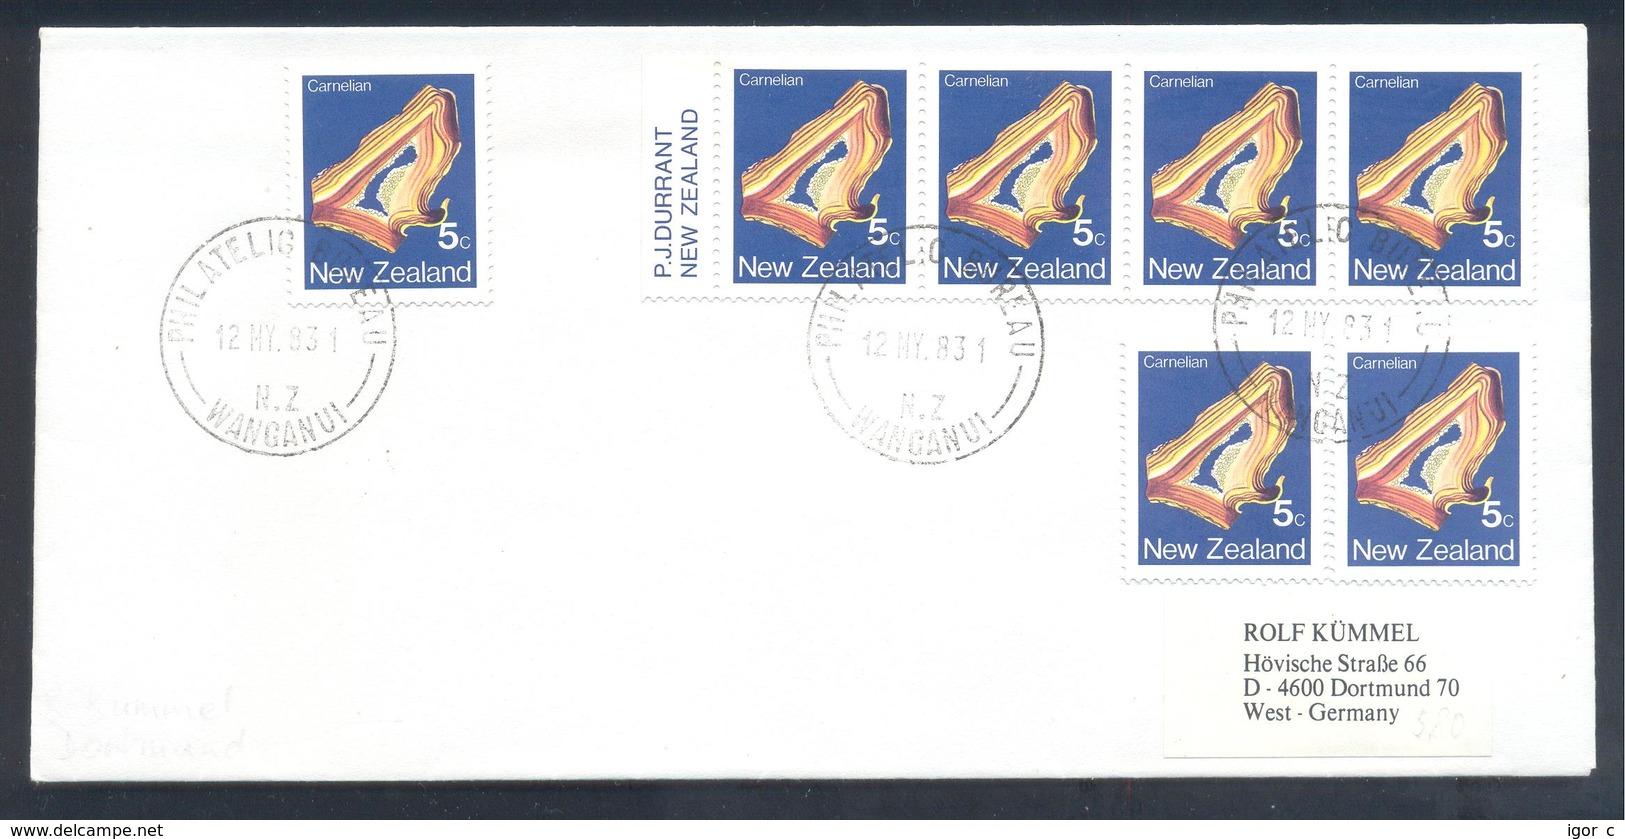 New Zealand 1983 Cover: Minerals Mineralien Mineraux; Mining Bergbau; Carnelian, Cornelian - Mineralien